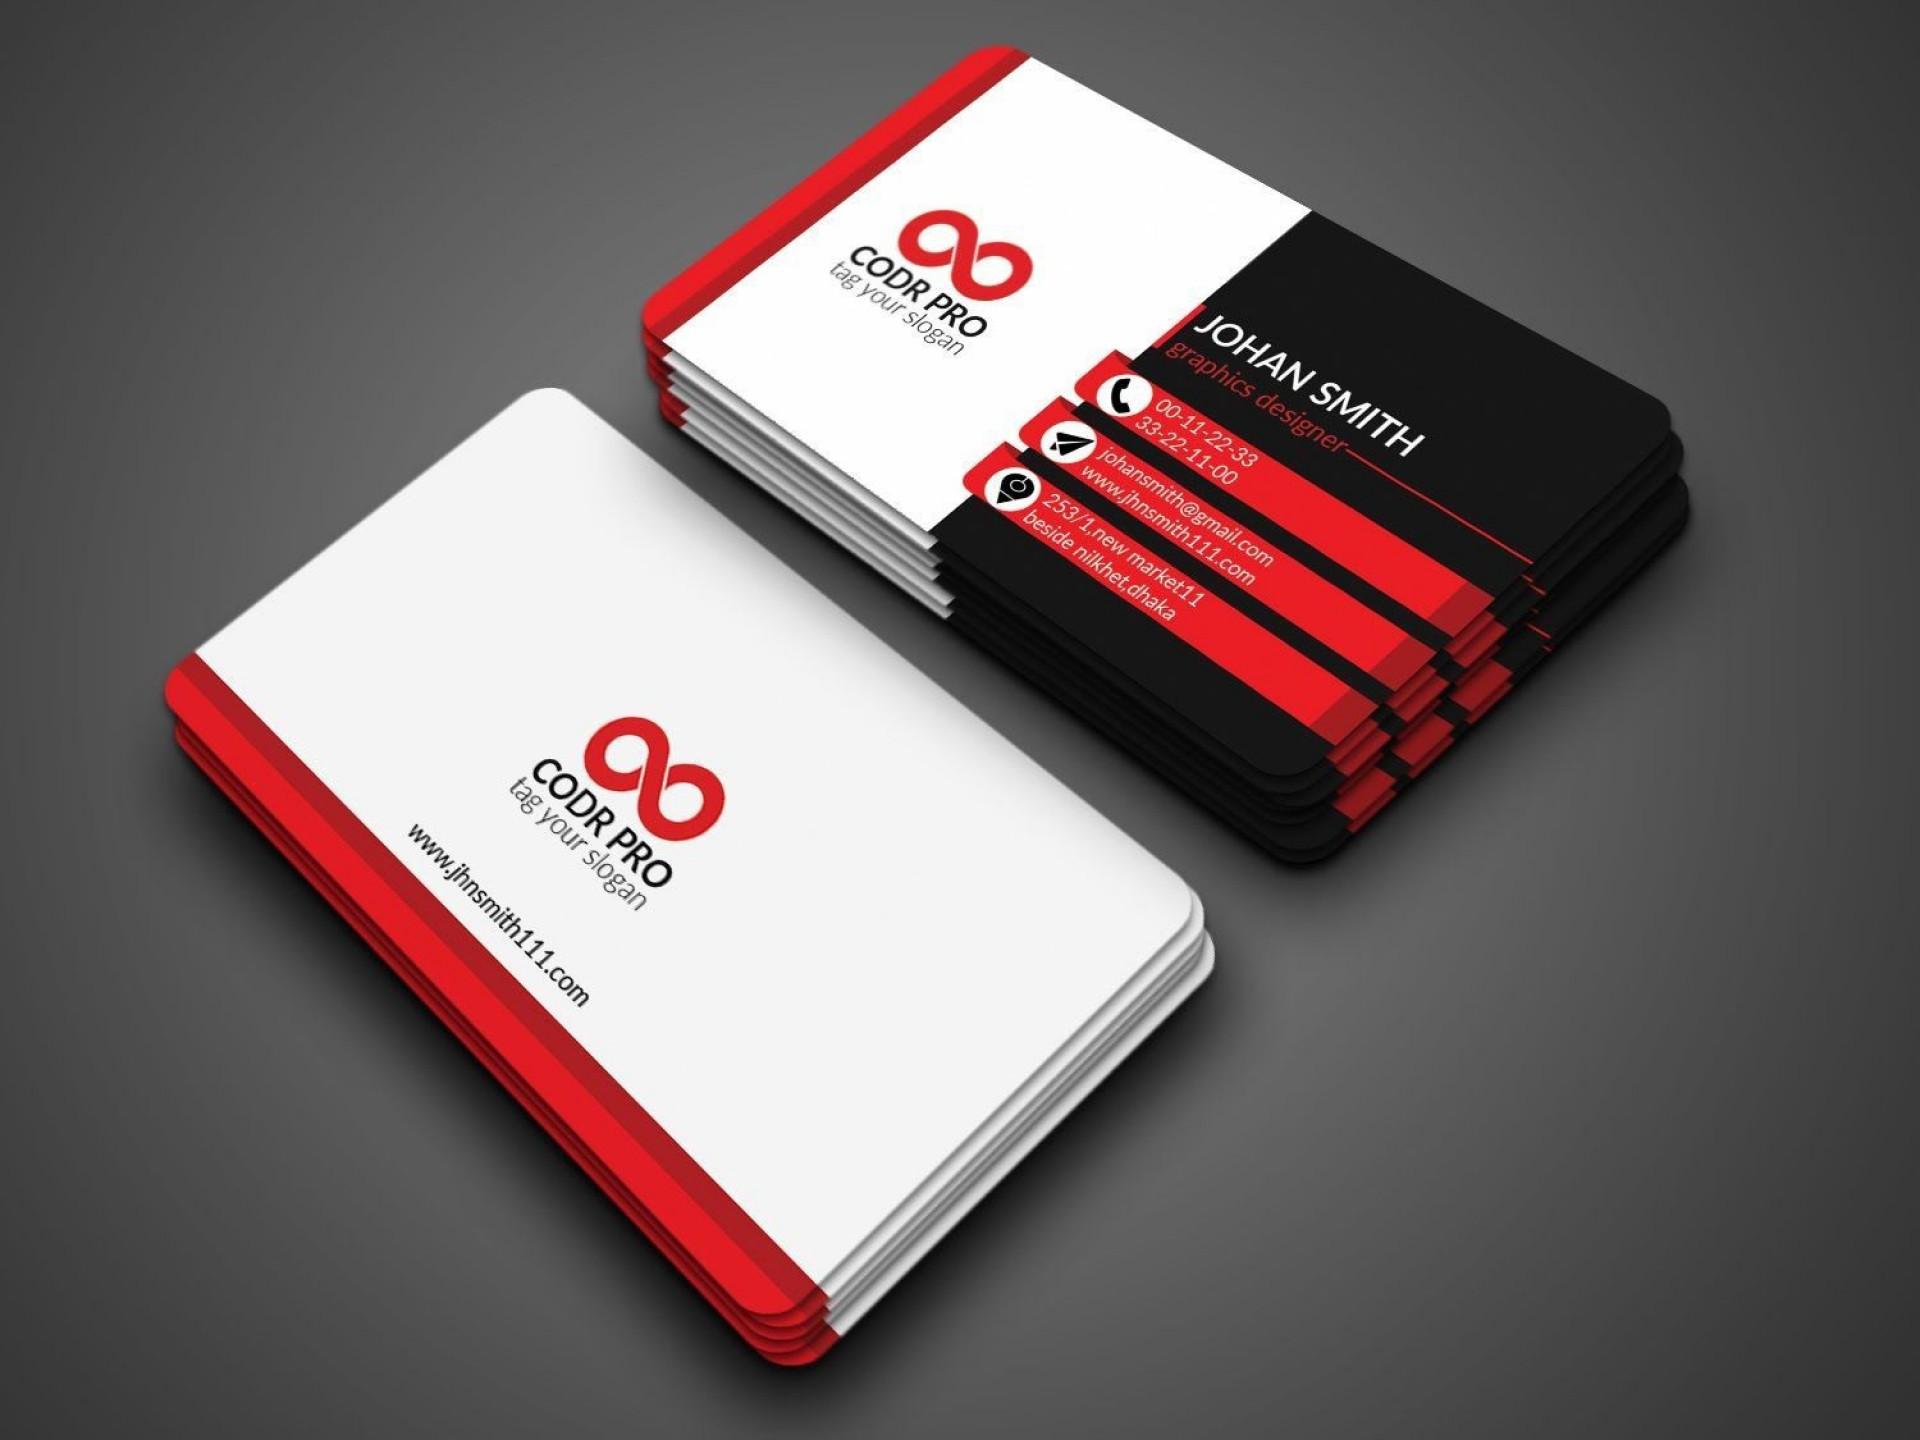 002 Singular Simple Busines Card Template Photoshop Concept 1920